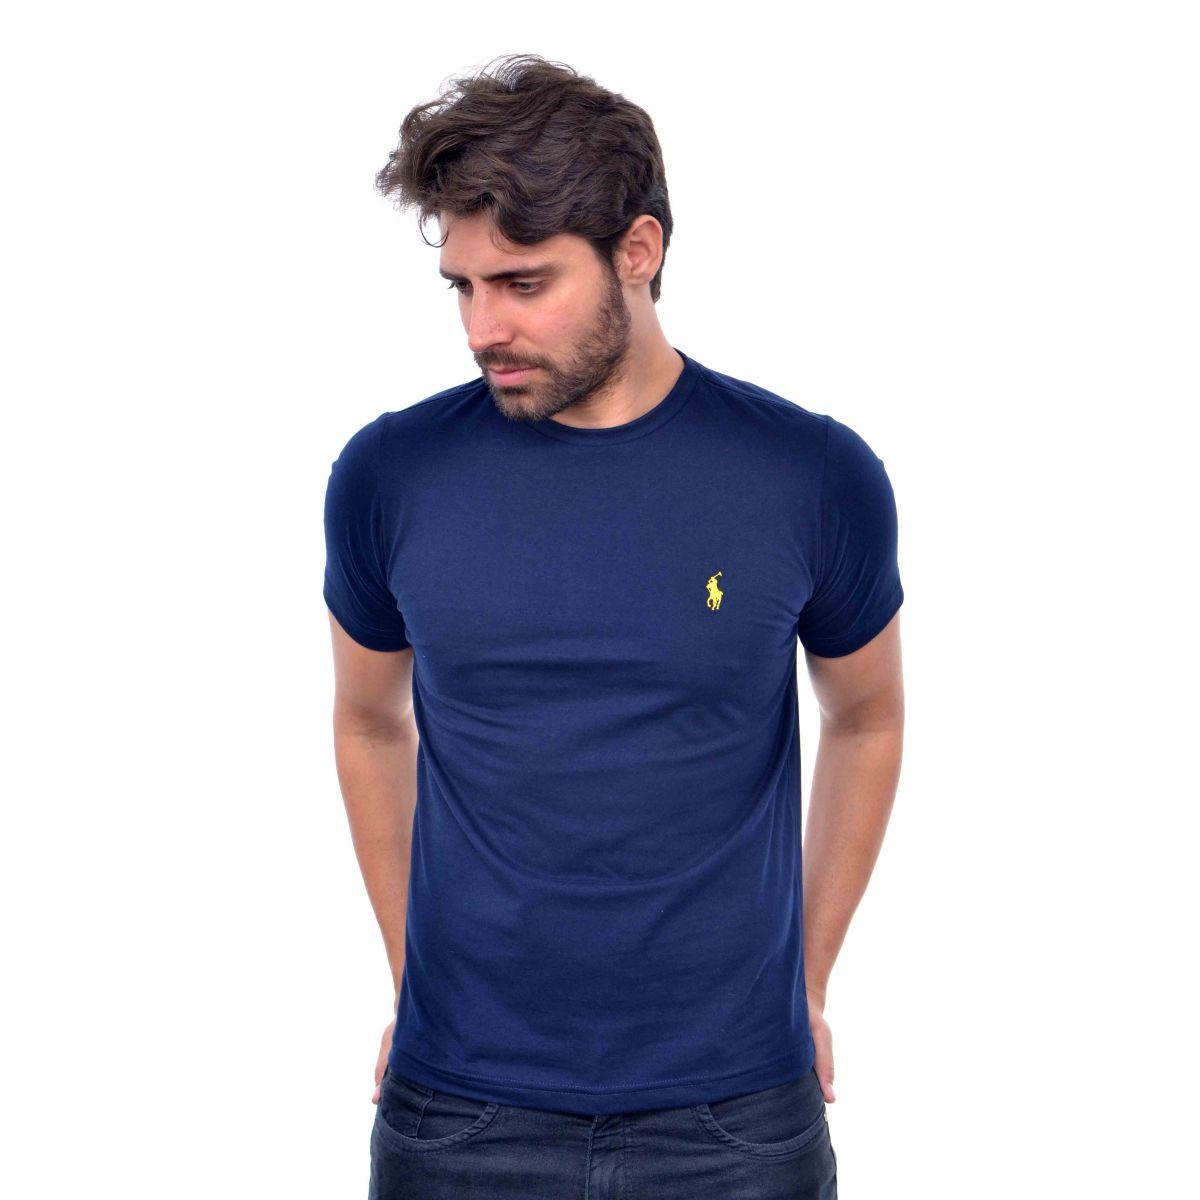 Camiseta Basic Ralph Lauren Azul Marinho